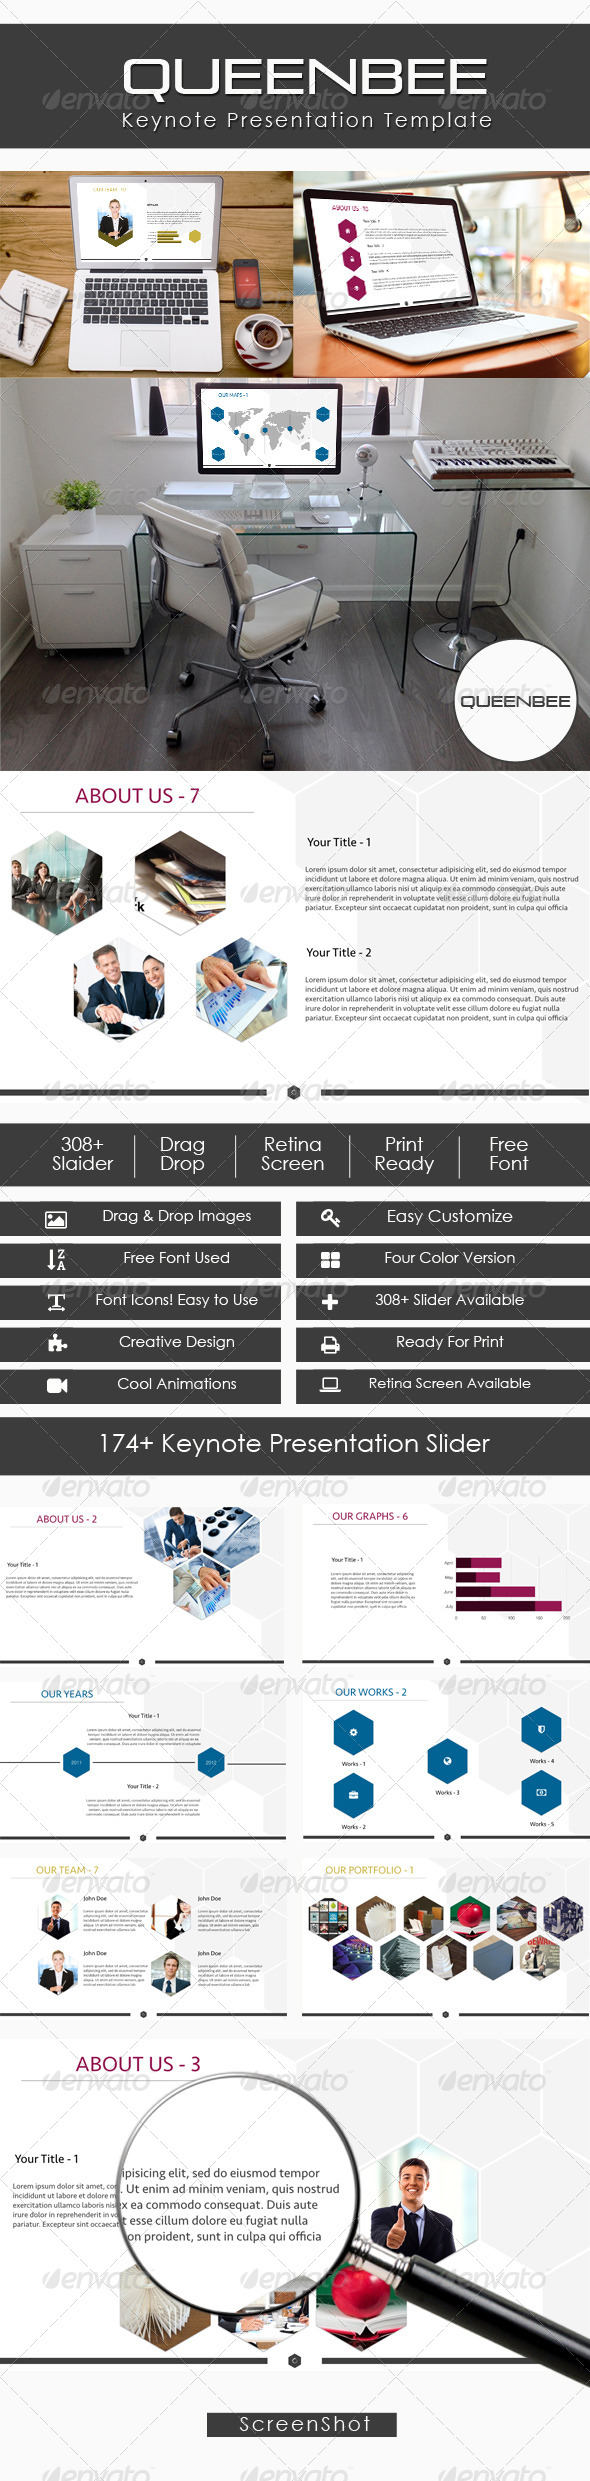 GraphicRiver QueenBee Creative Keynote Presentation 7586058